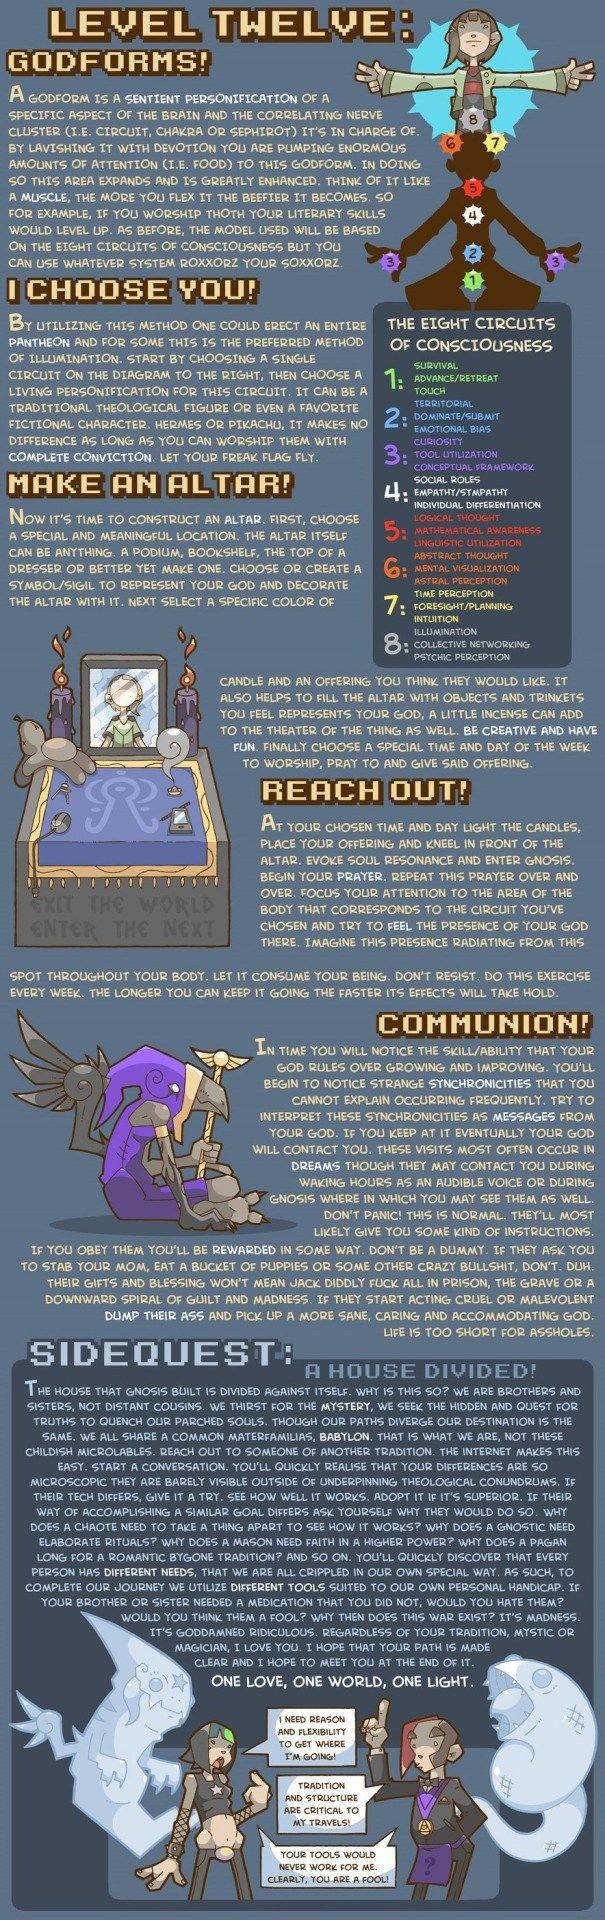 Chaos Magick Psychonaut Field Manual by Archtraitor Bluefluke